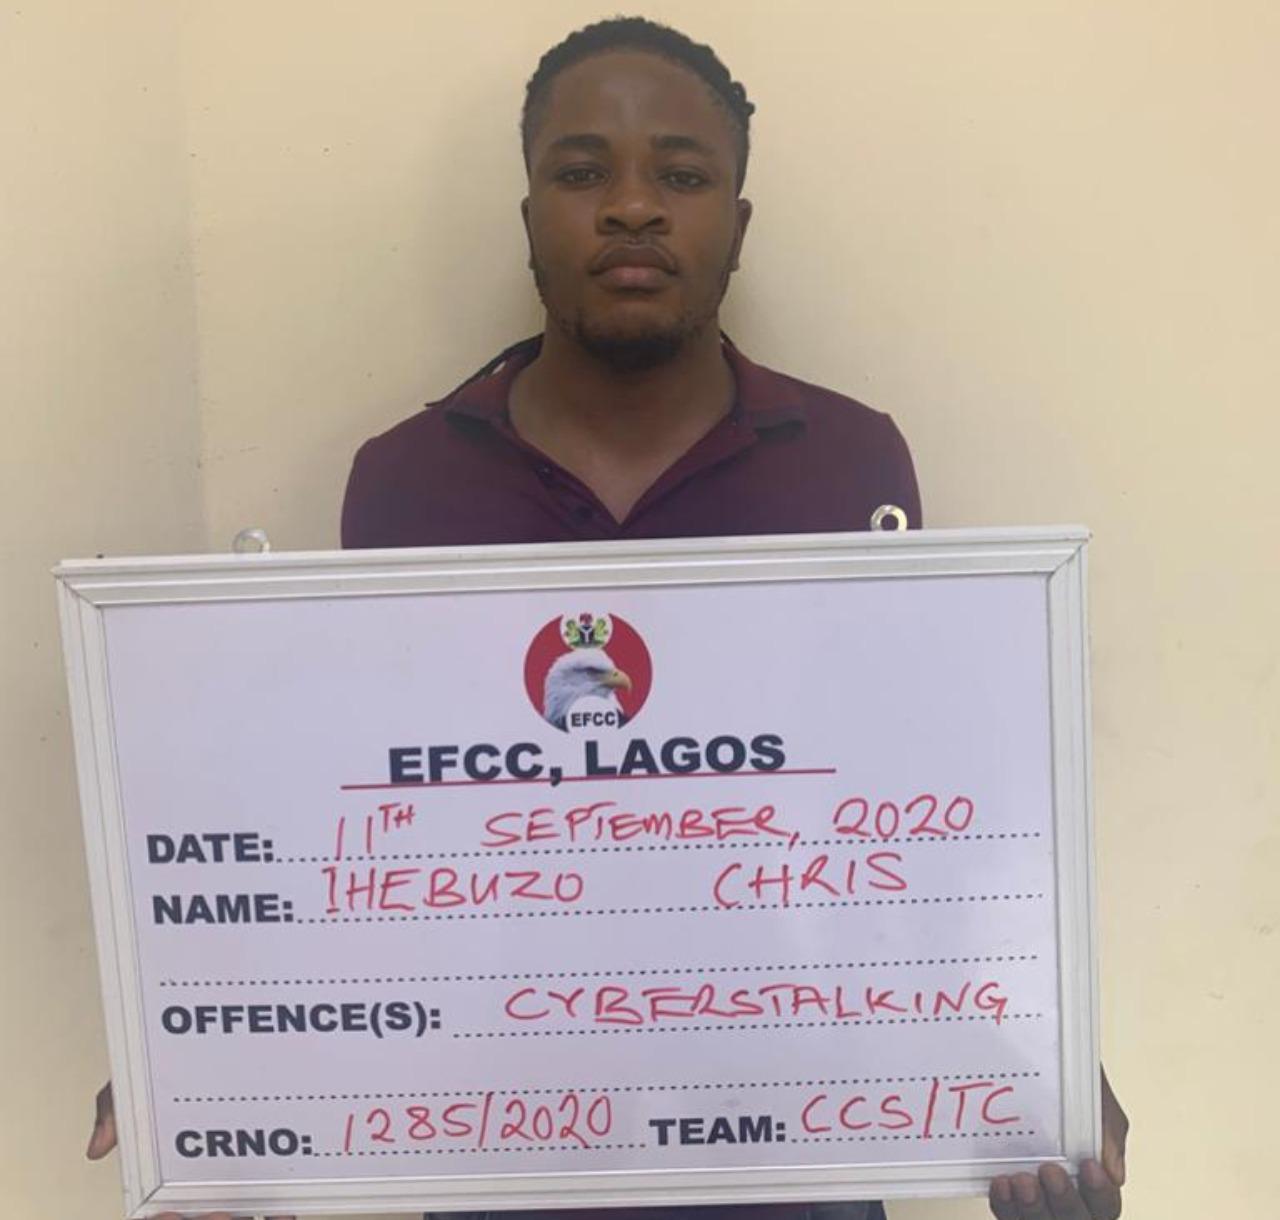 EFCC arrests suspect with 2,000 bank account details, ATM cards